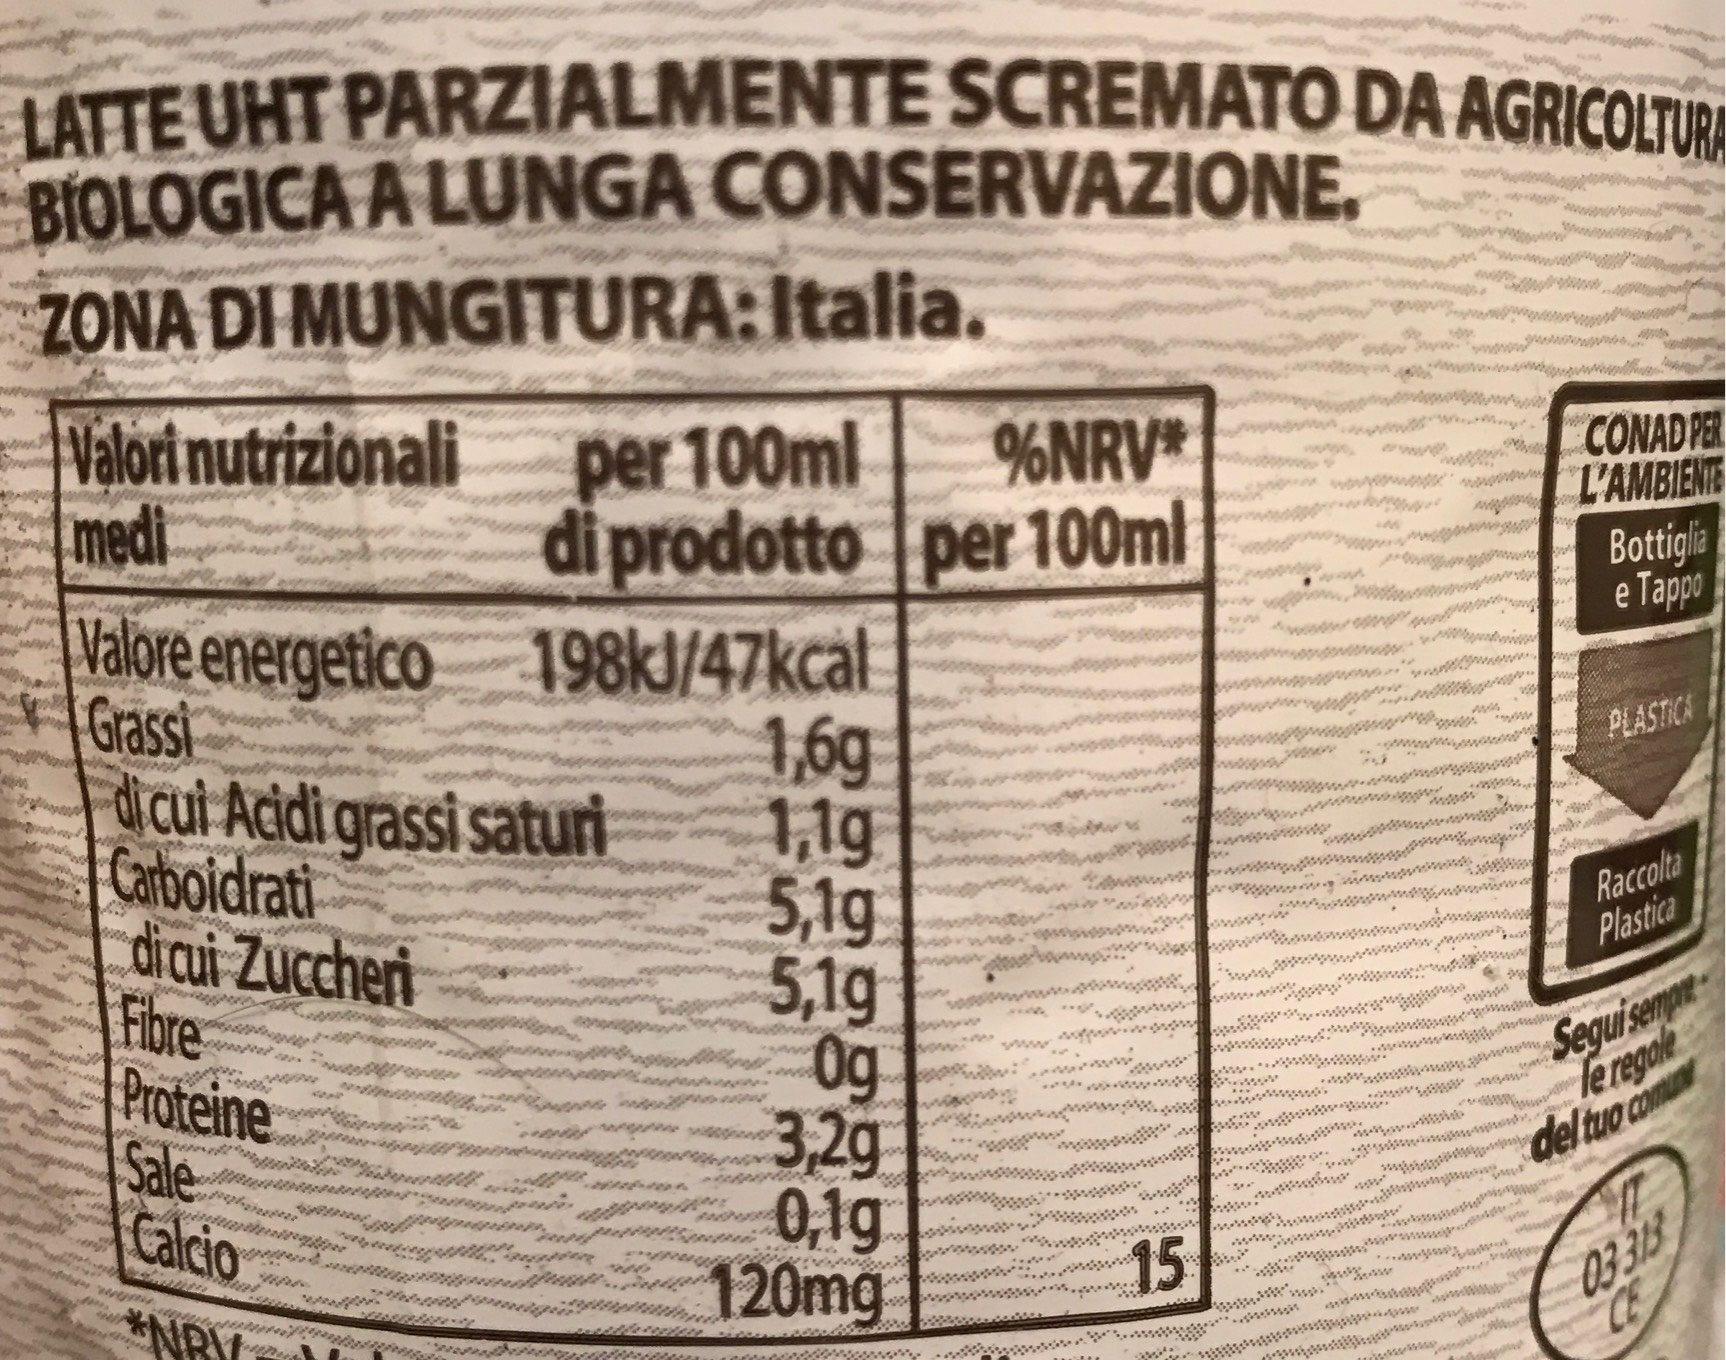 Latte Parzialmente Scremato Biologico (Conad) - Informations nutritionnelles - fr